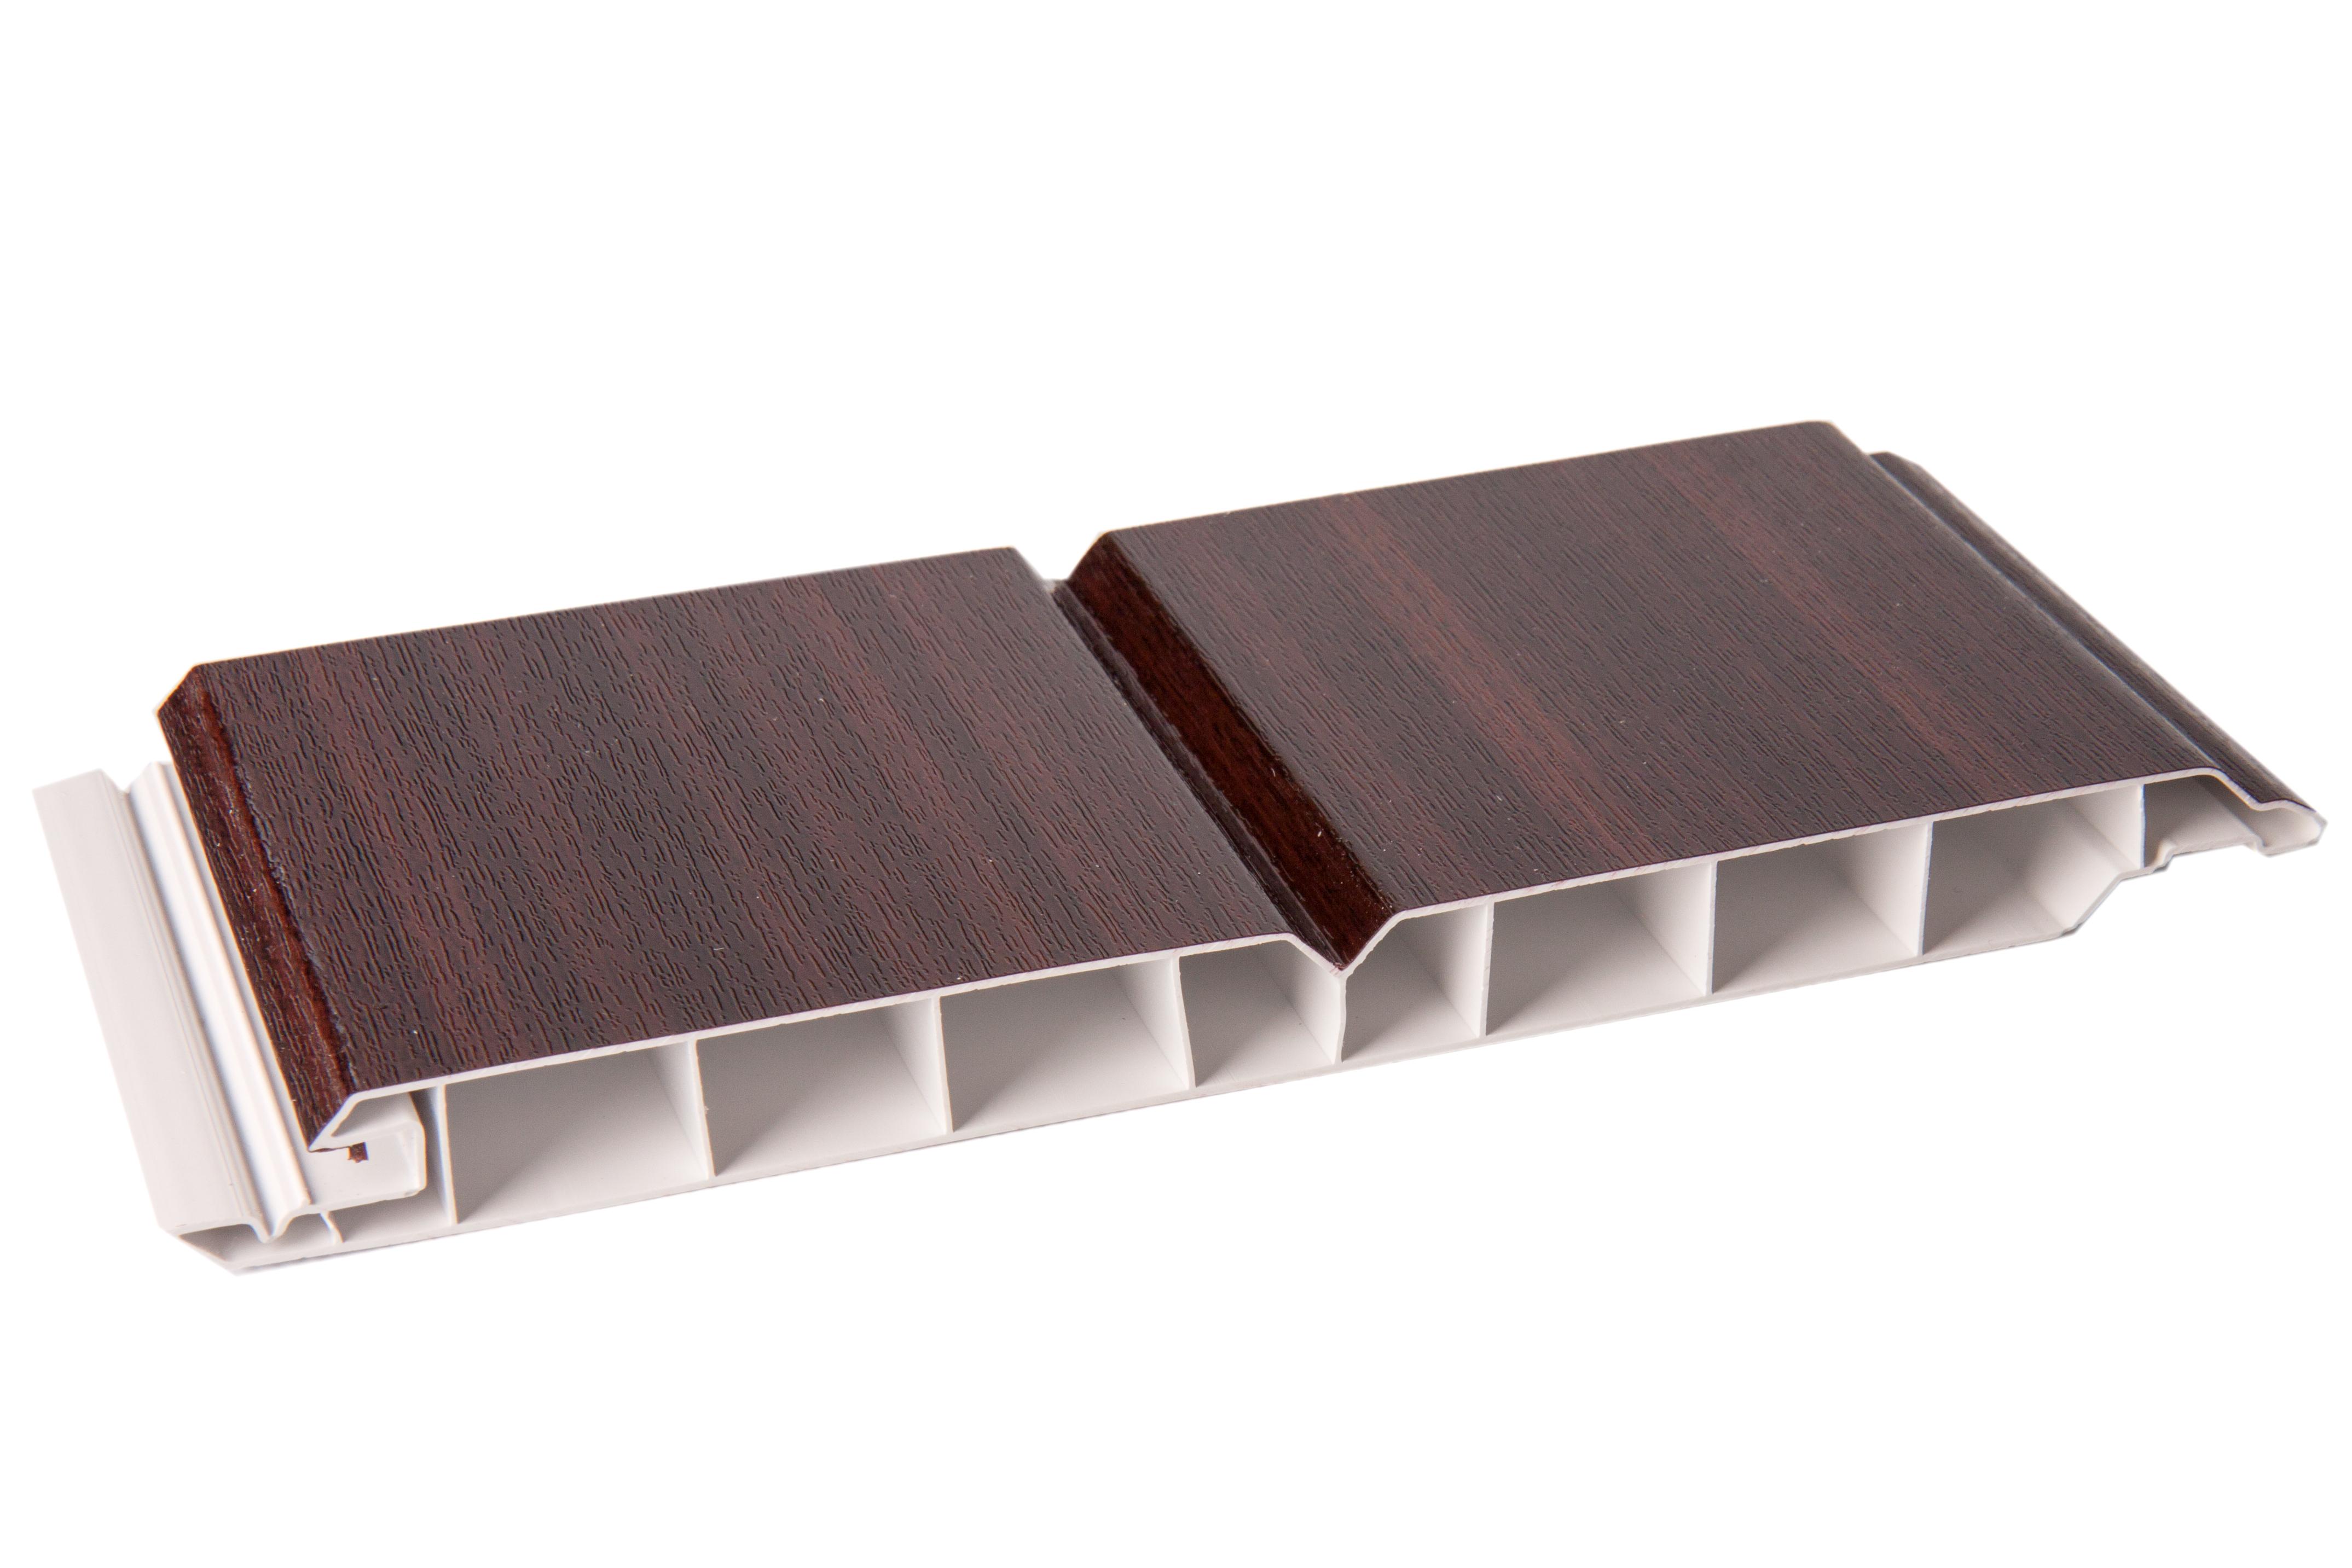 dekorpaneele 17 200mm mahagoni dachplatten24. Black Bedroom Furniture Sets. Home Design Ideas